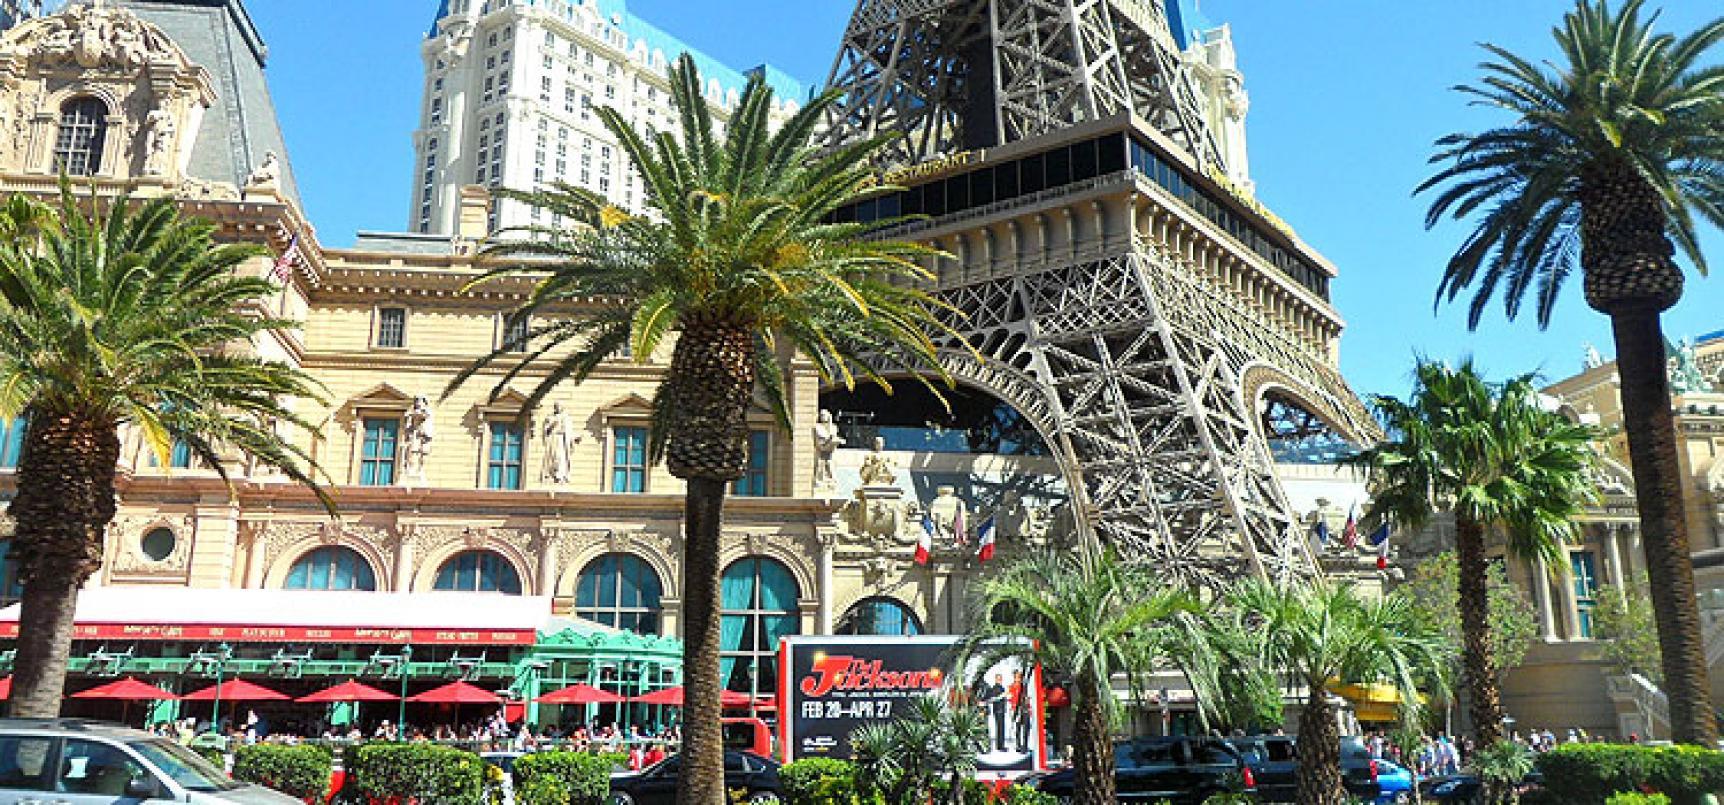 Paris Las Vegas Hotel & Casino Eifel Tower